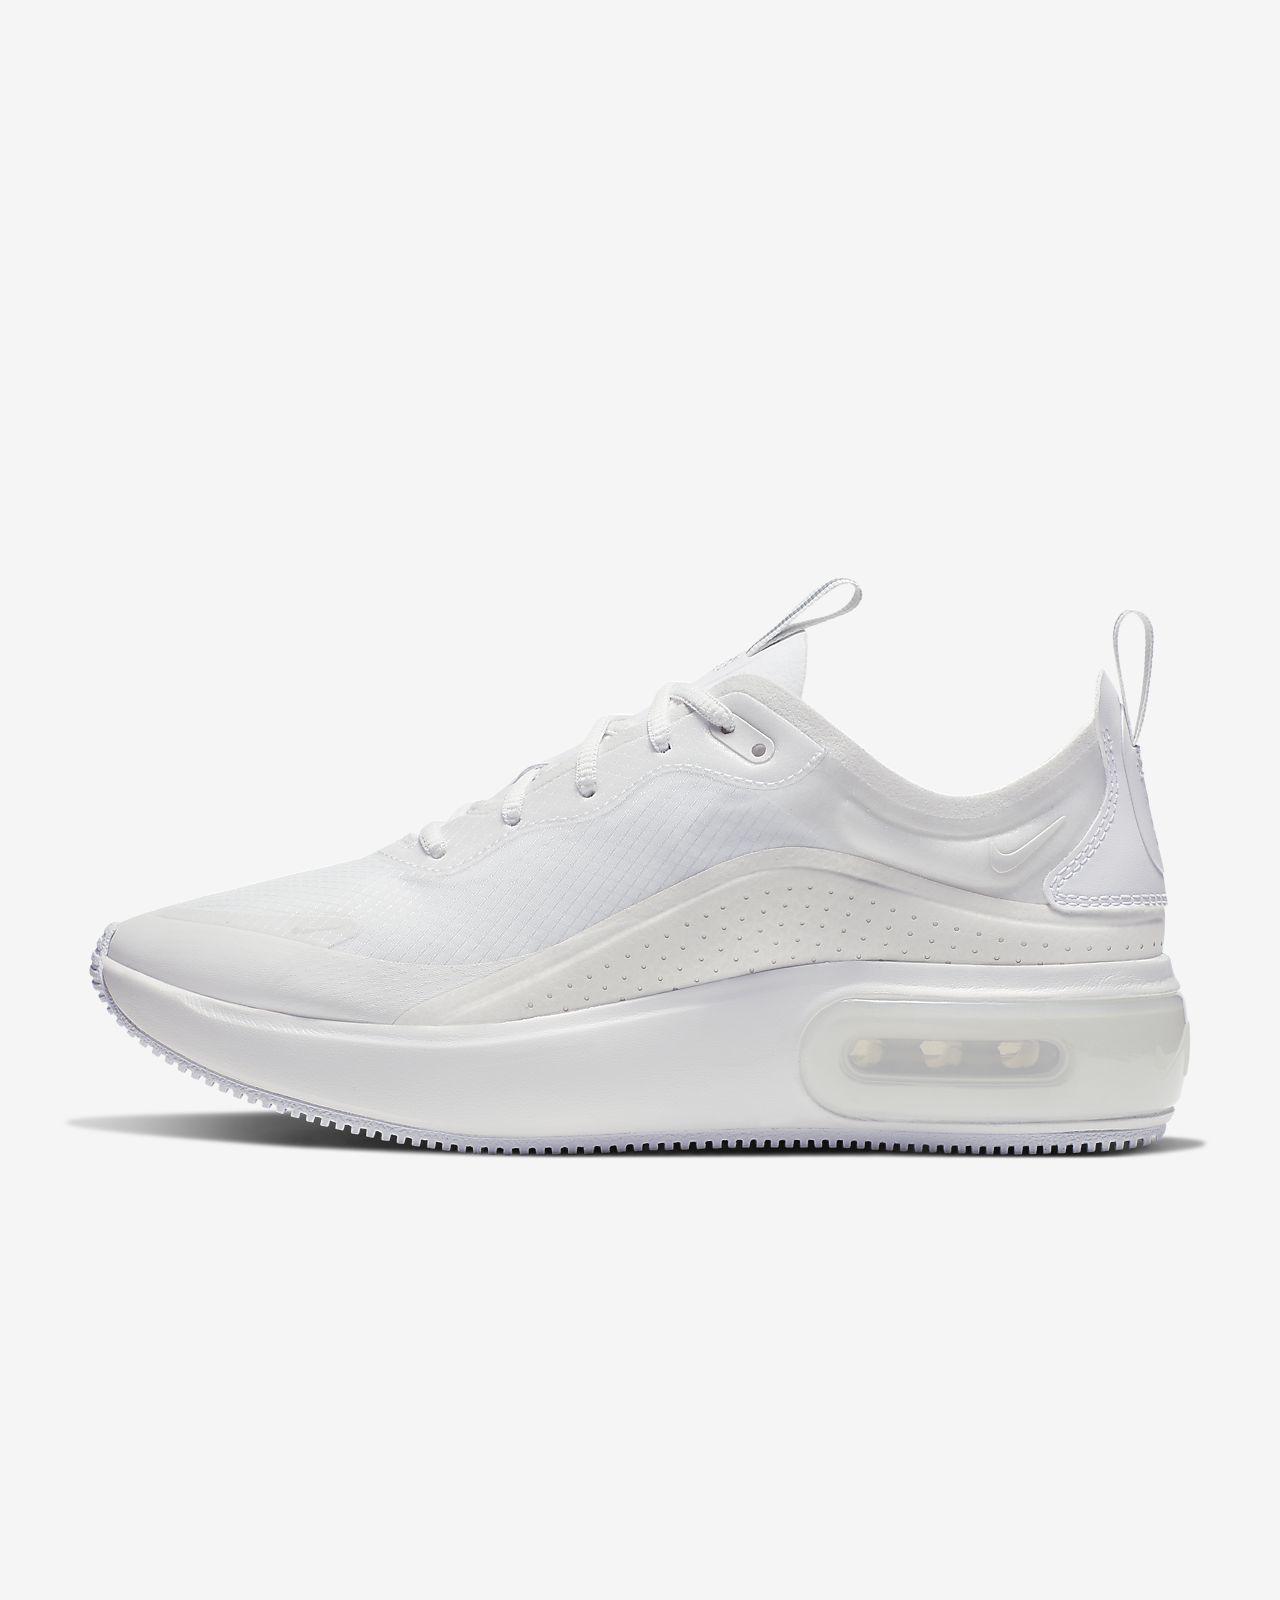 check out 566e3 54ac5 ... Nike Air Max Dia SE Shoe